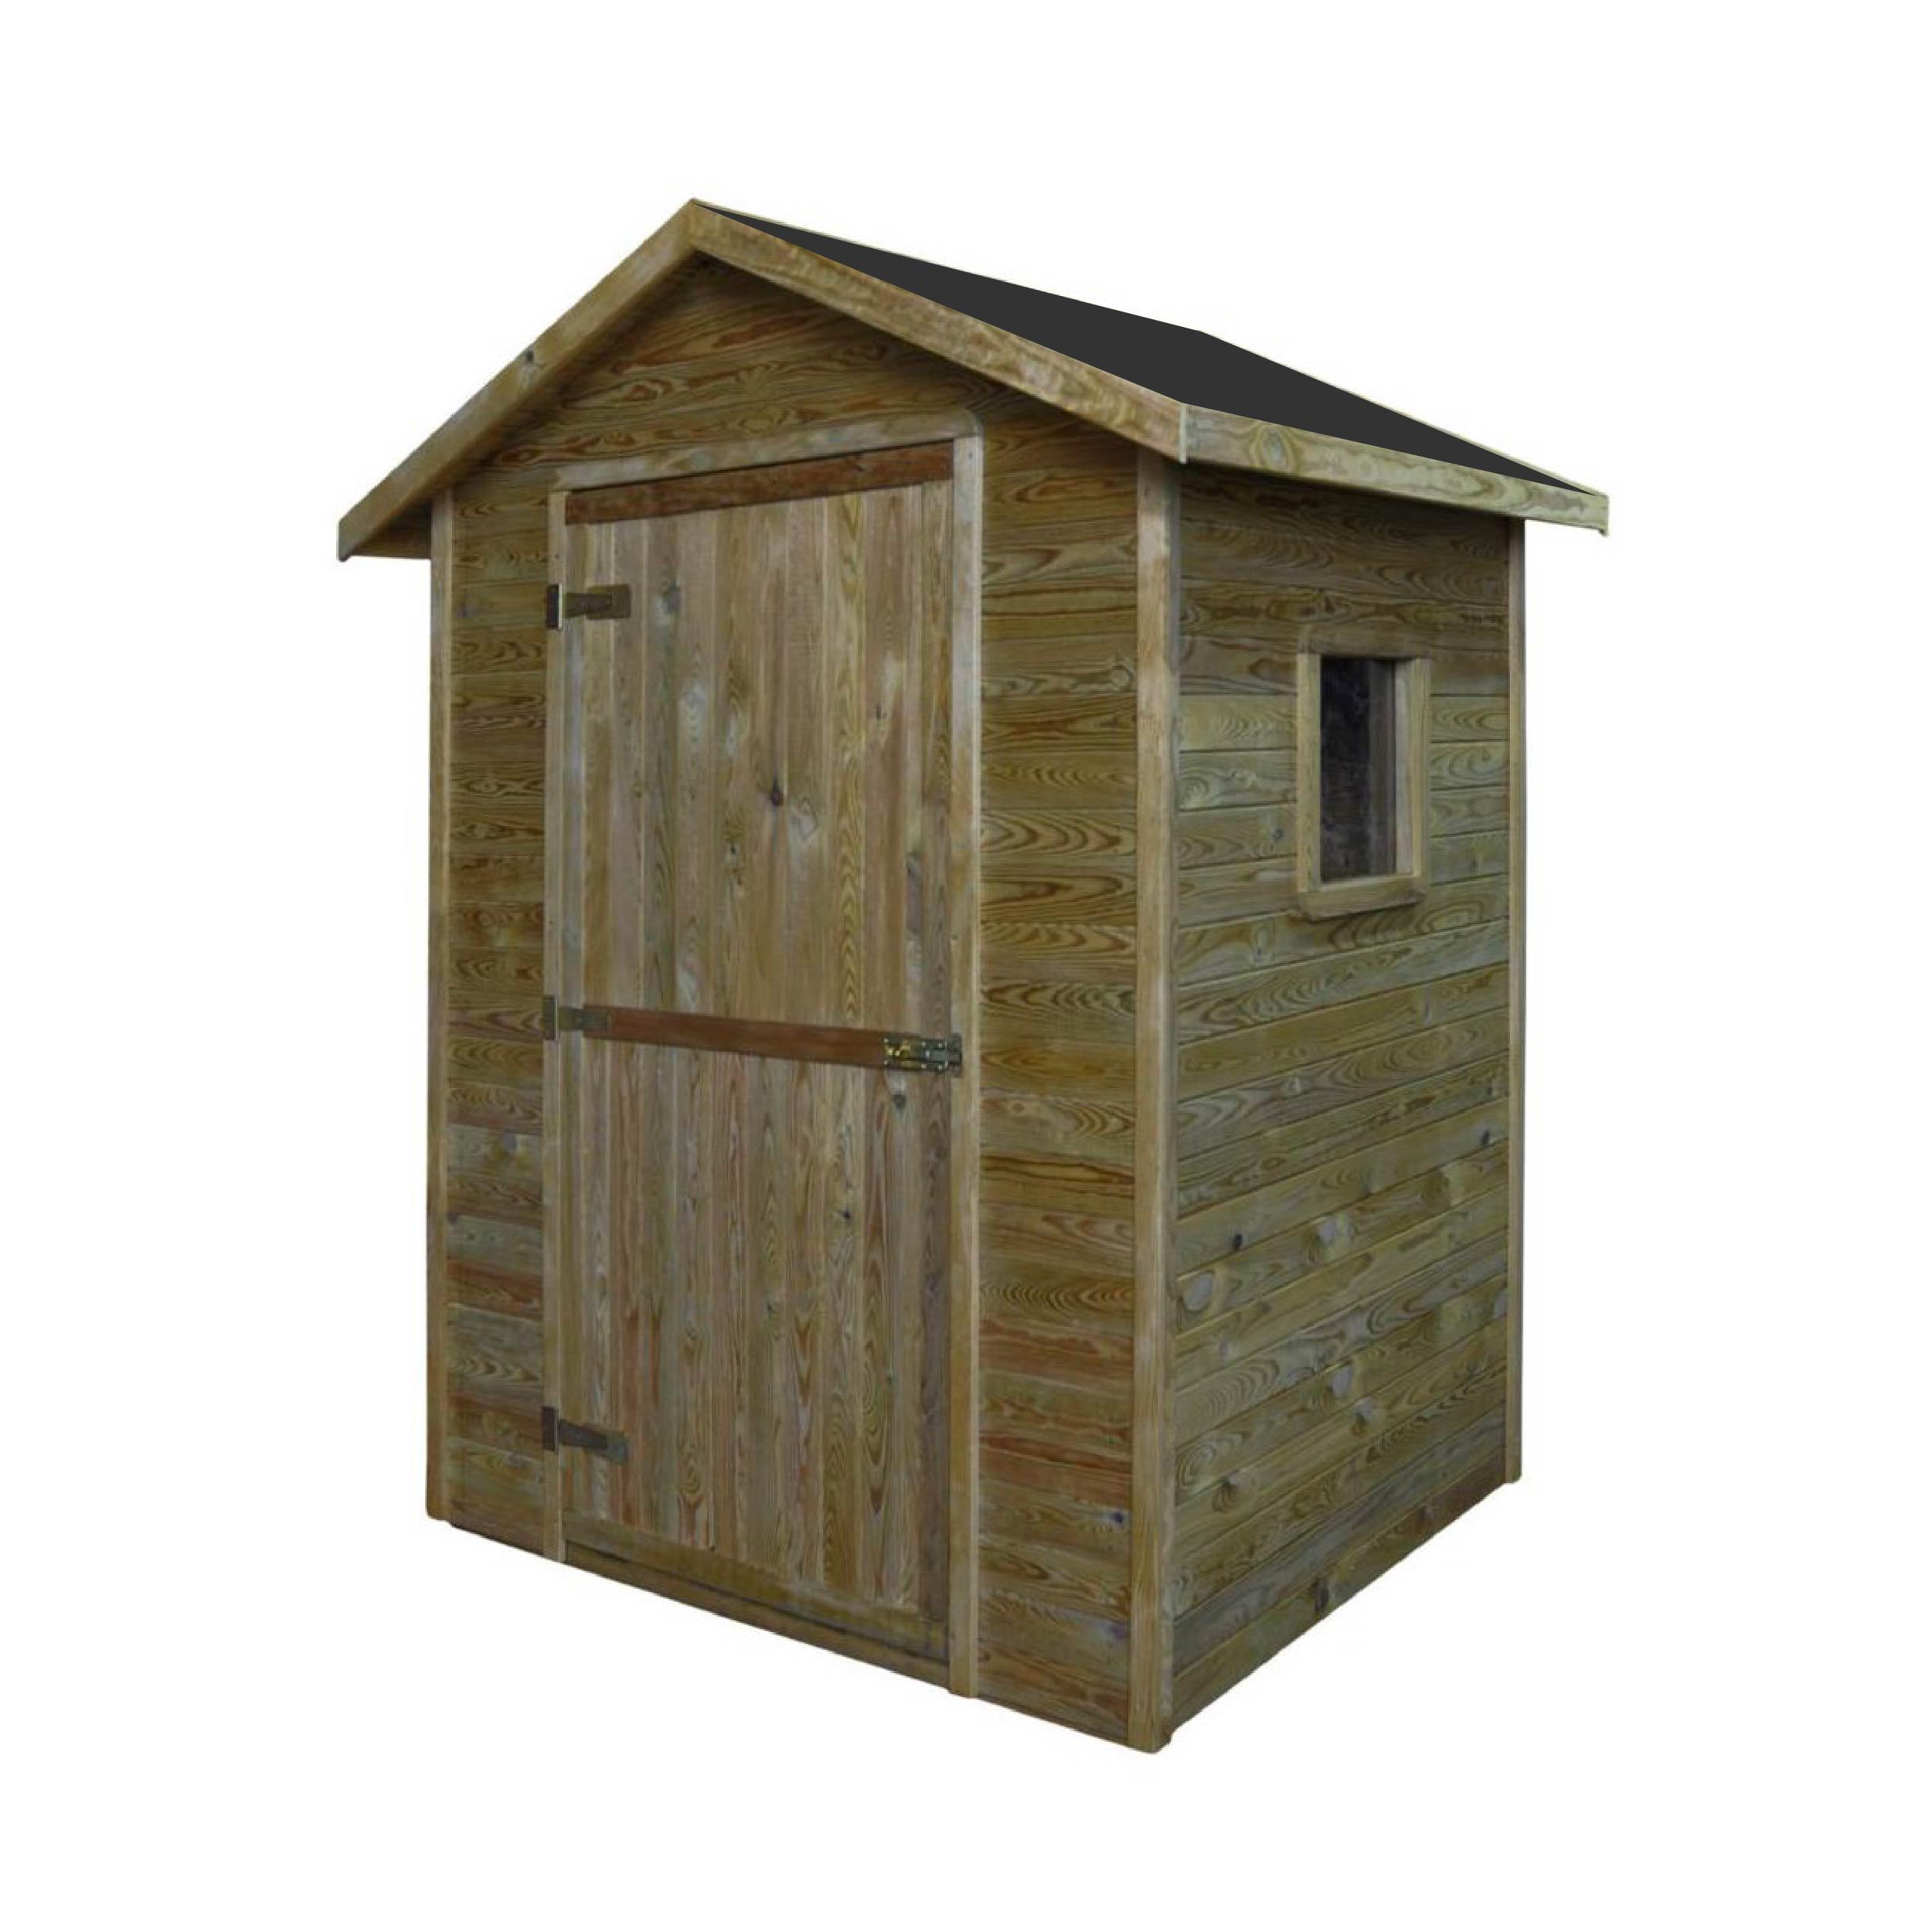 Gartenhäuser bis 4 m2 | Gartenhaus aus Holz 1,5m x 1,5m ...